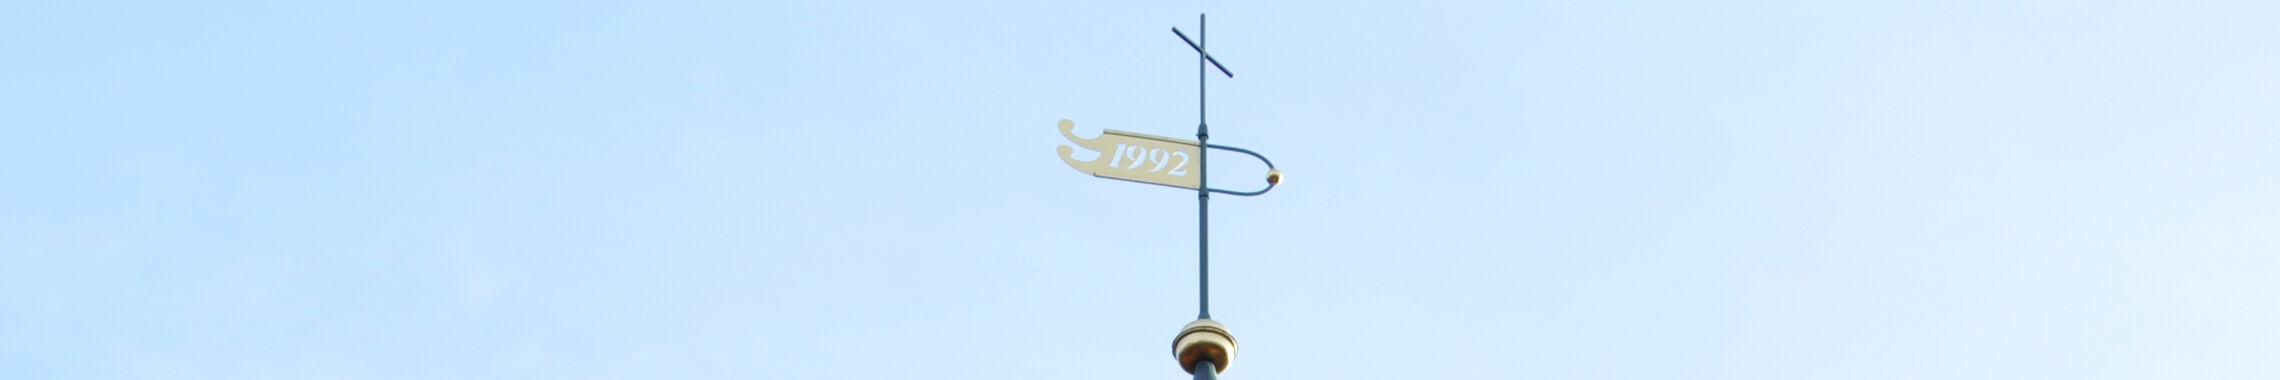 thomasburg kirchenspitze kopfbild c